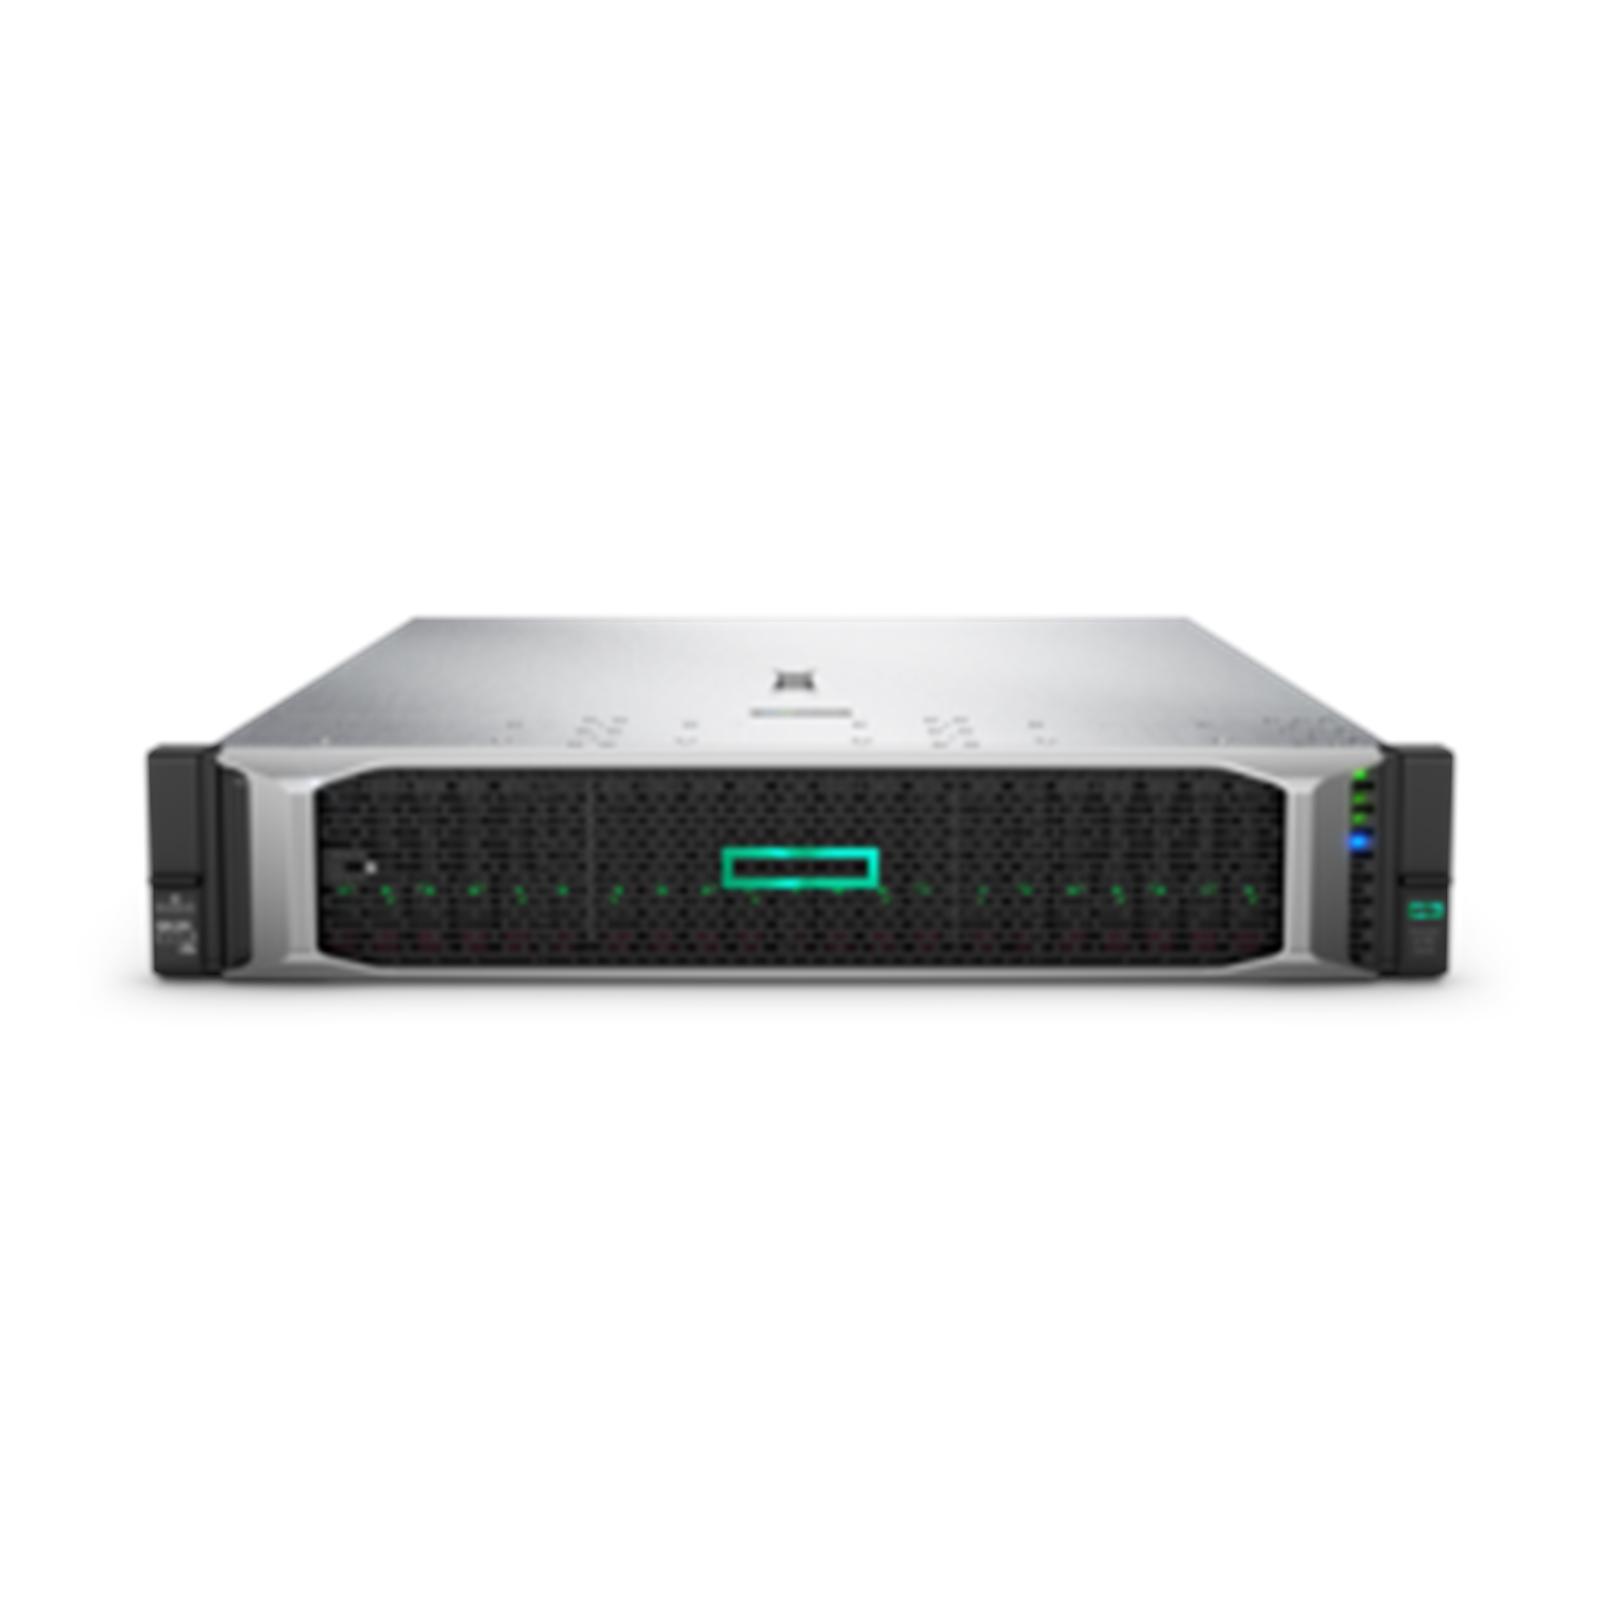 HPE Rack Servers - Hewlett Packard 879938-B21   Servers Plus